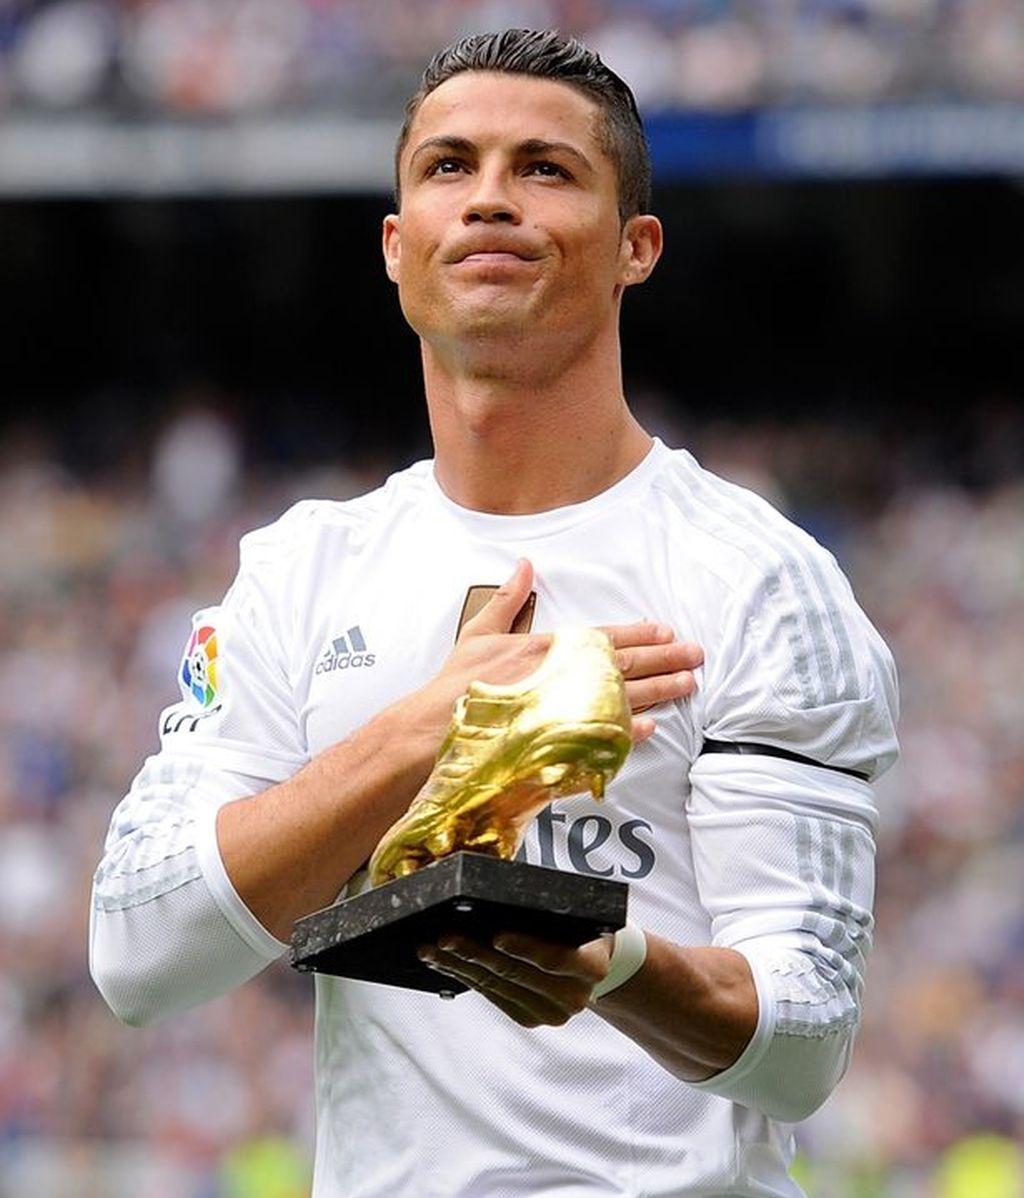 Cristiano Ronaldo,Real Madrid,Adidas